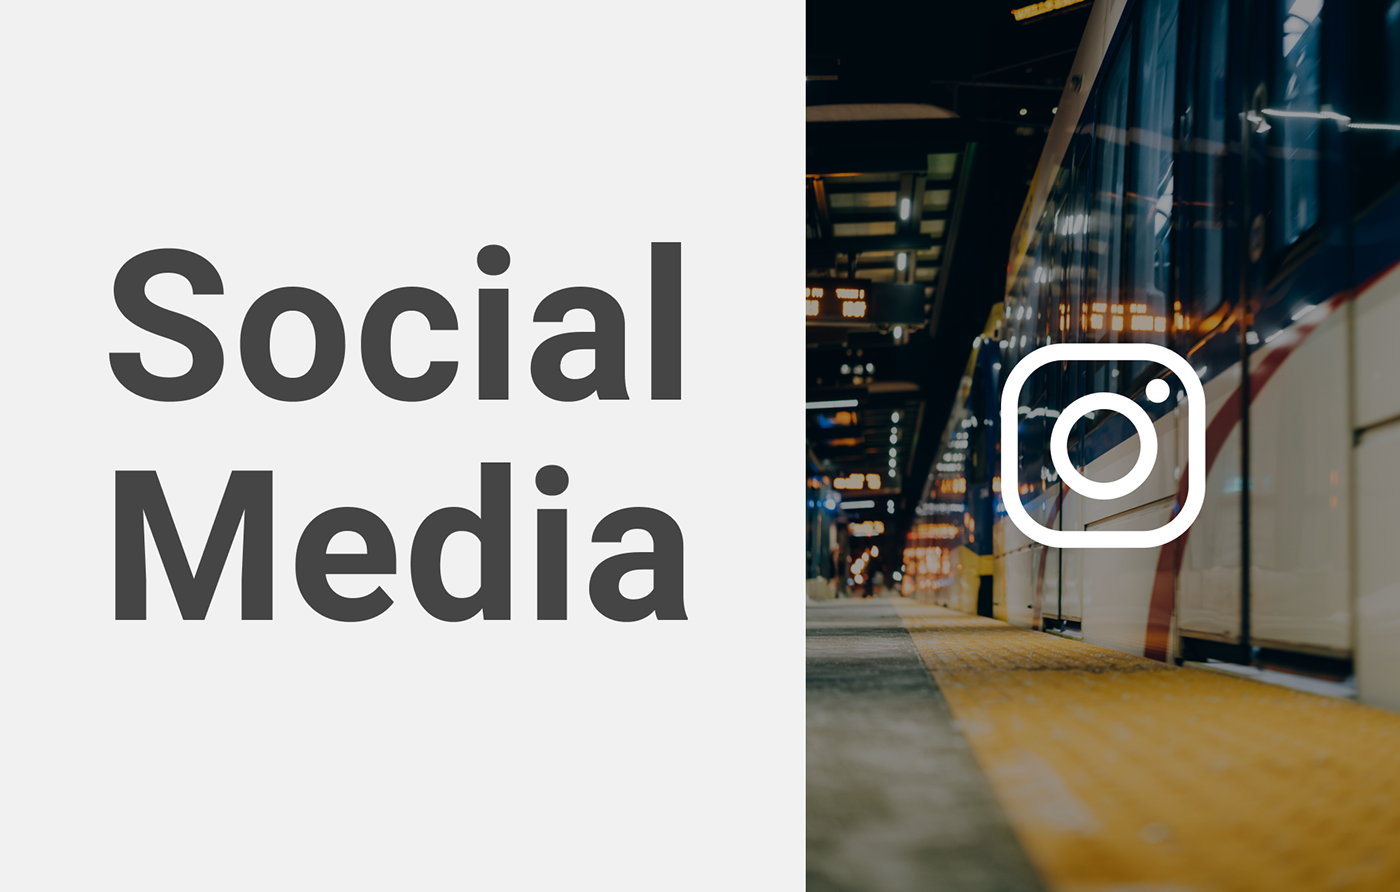 Advertising  designsocialmedia highlights instagram post subway дизайн постов инстаграм метро реклама